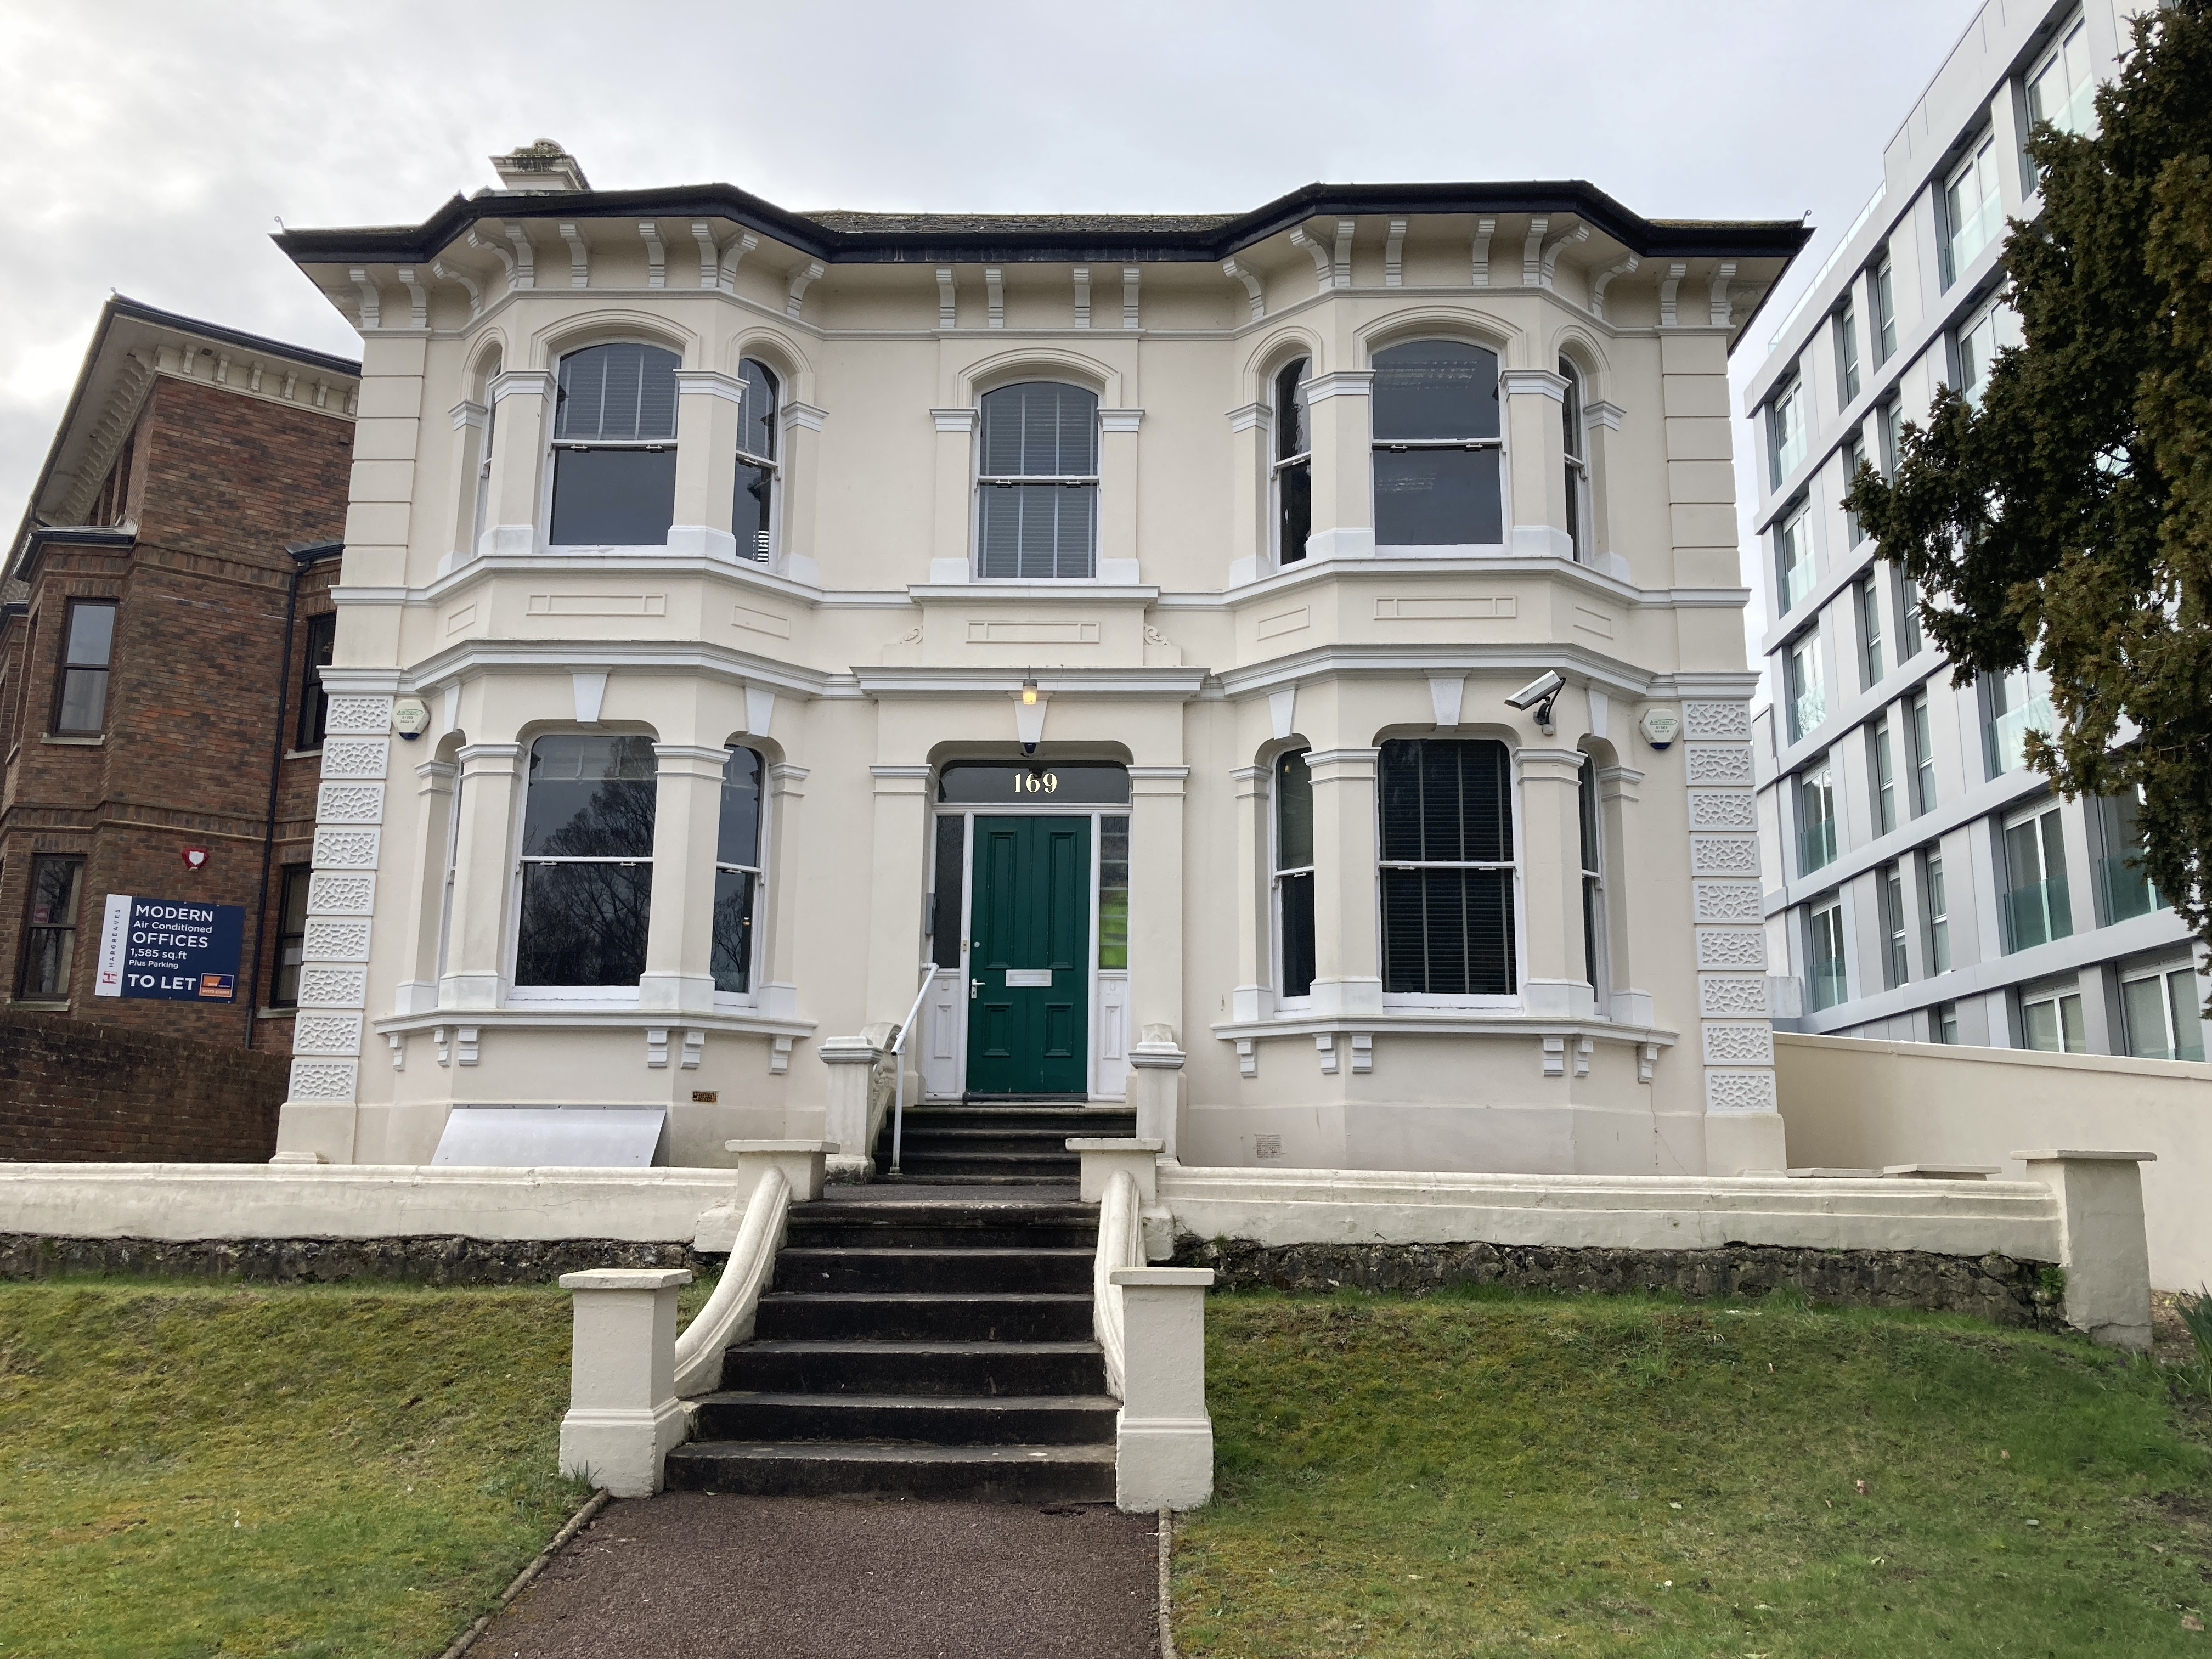 169 Preston Road Brighton image.